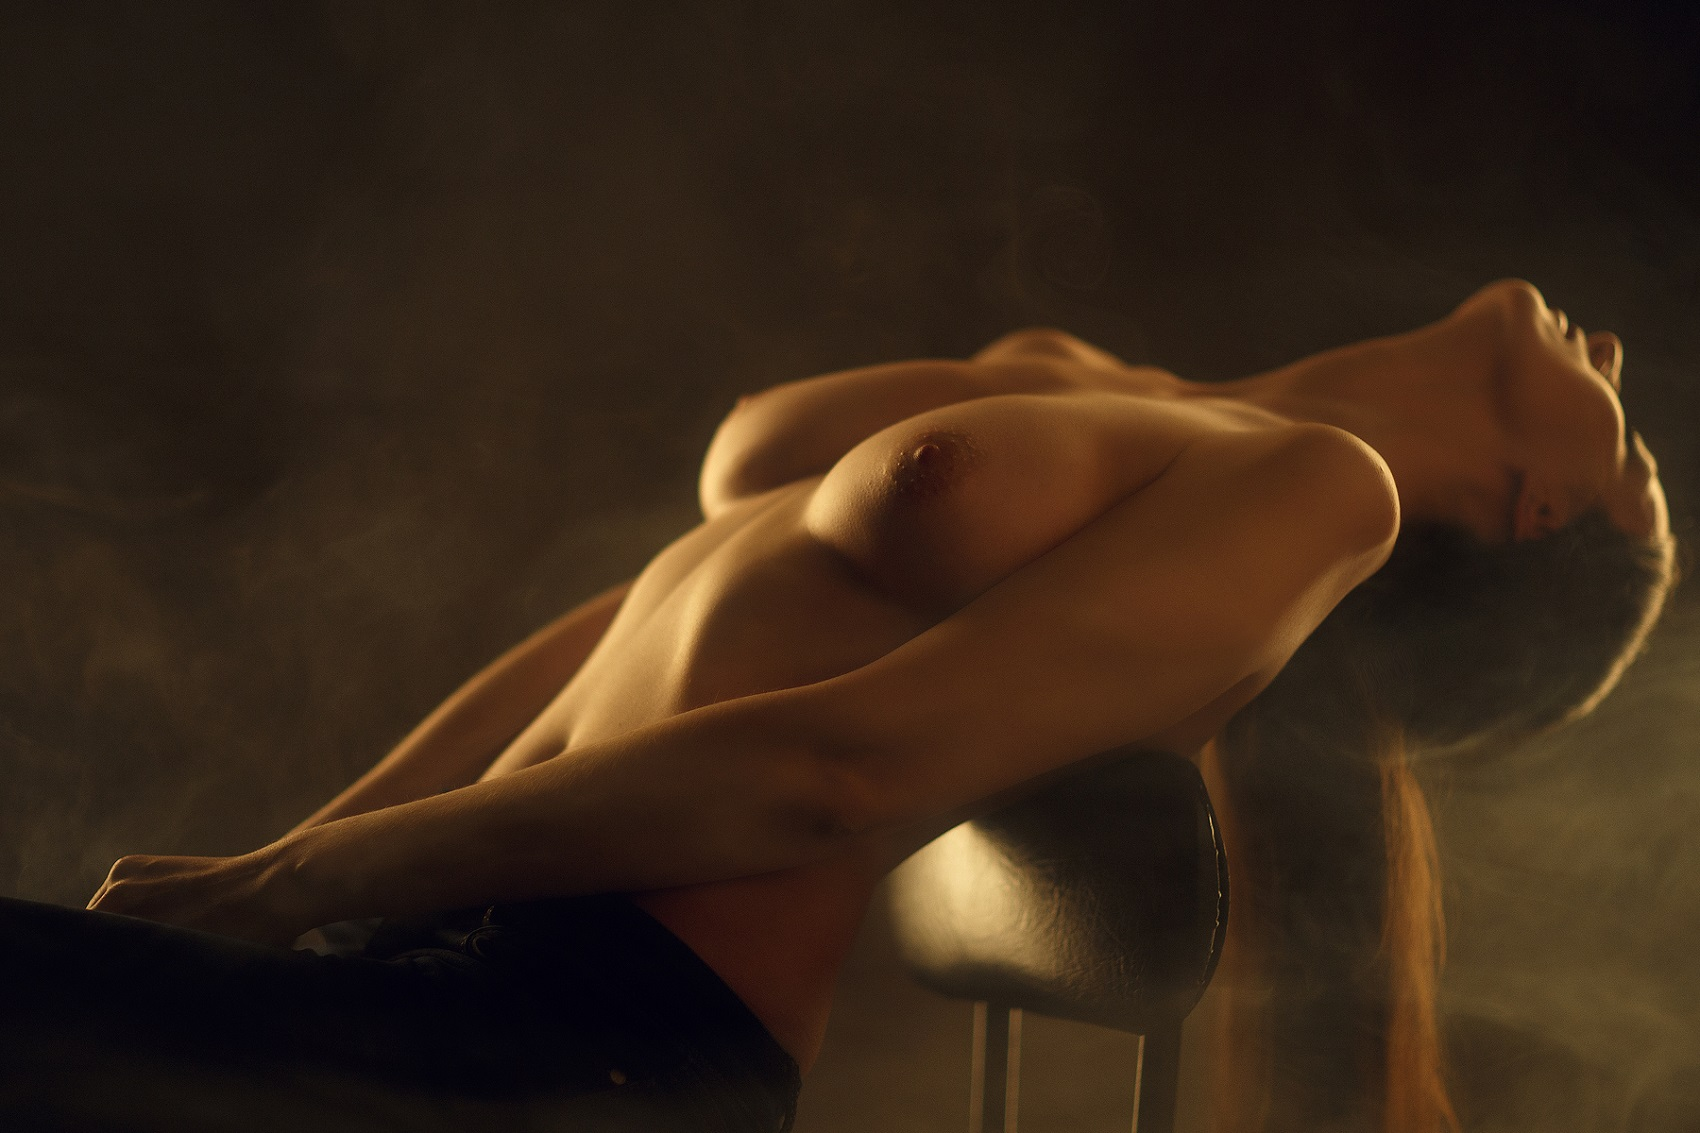 krasivie-gifki-erotika